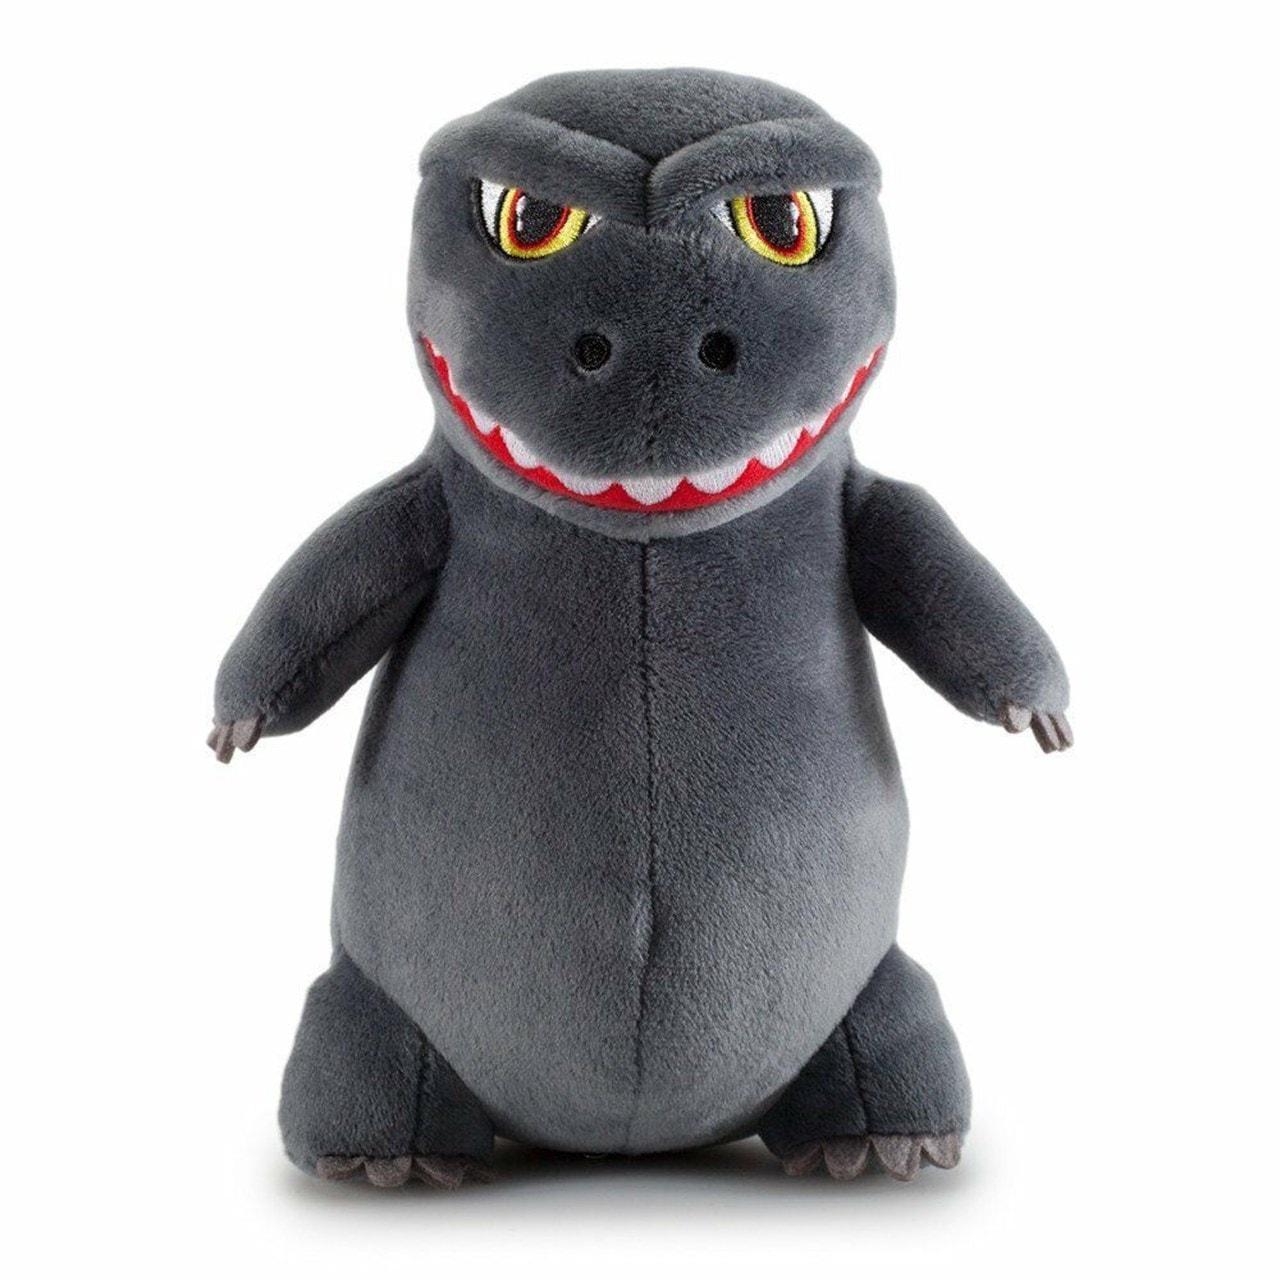 NECA Kidrobot: Godzilla Phunny Medium HugMe Soft Toy - 2